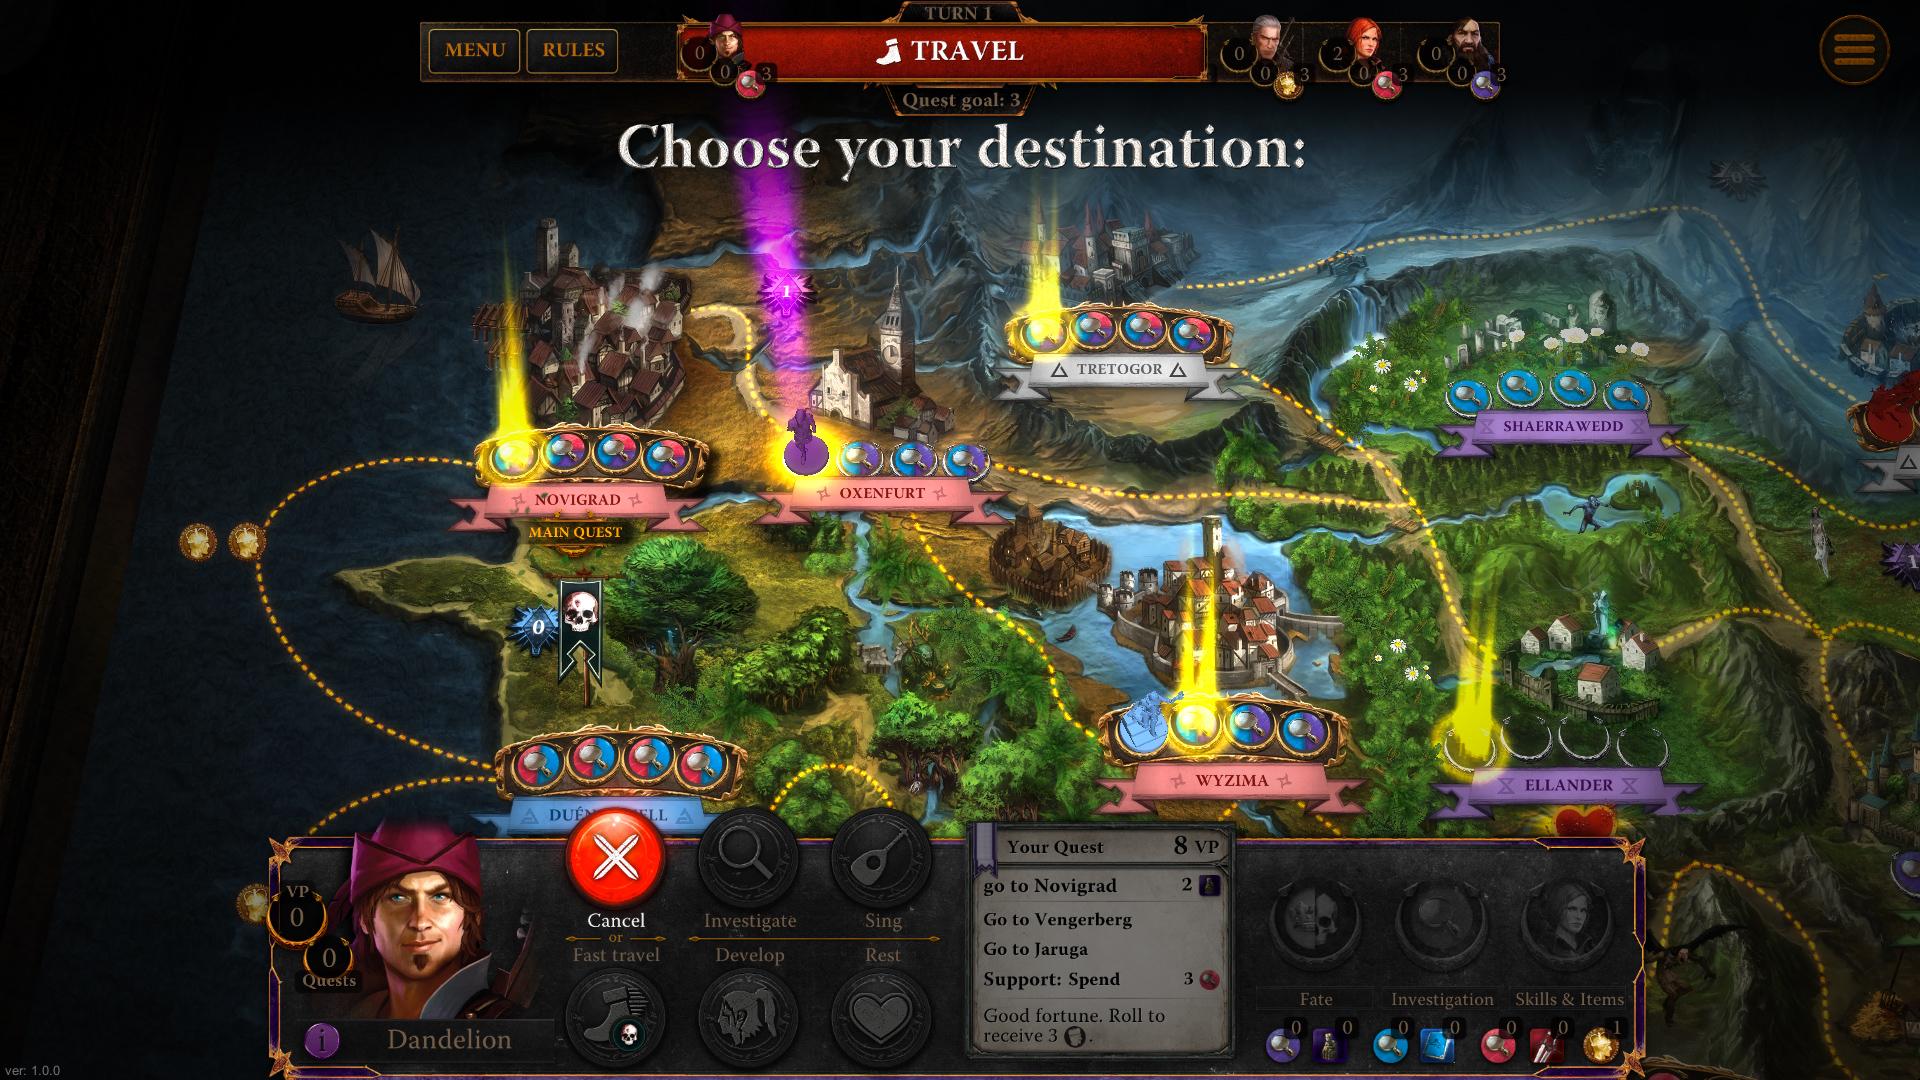 witcher_adventure_game_screenshot_gog_01